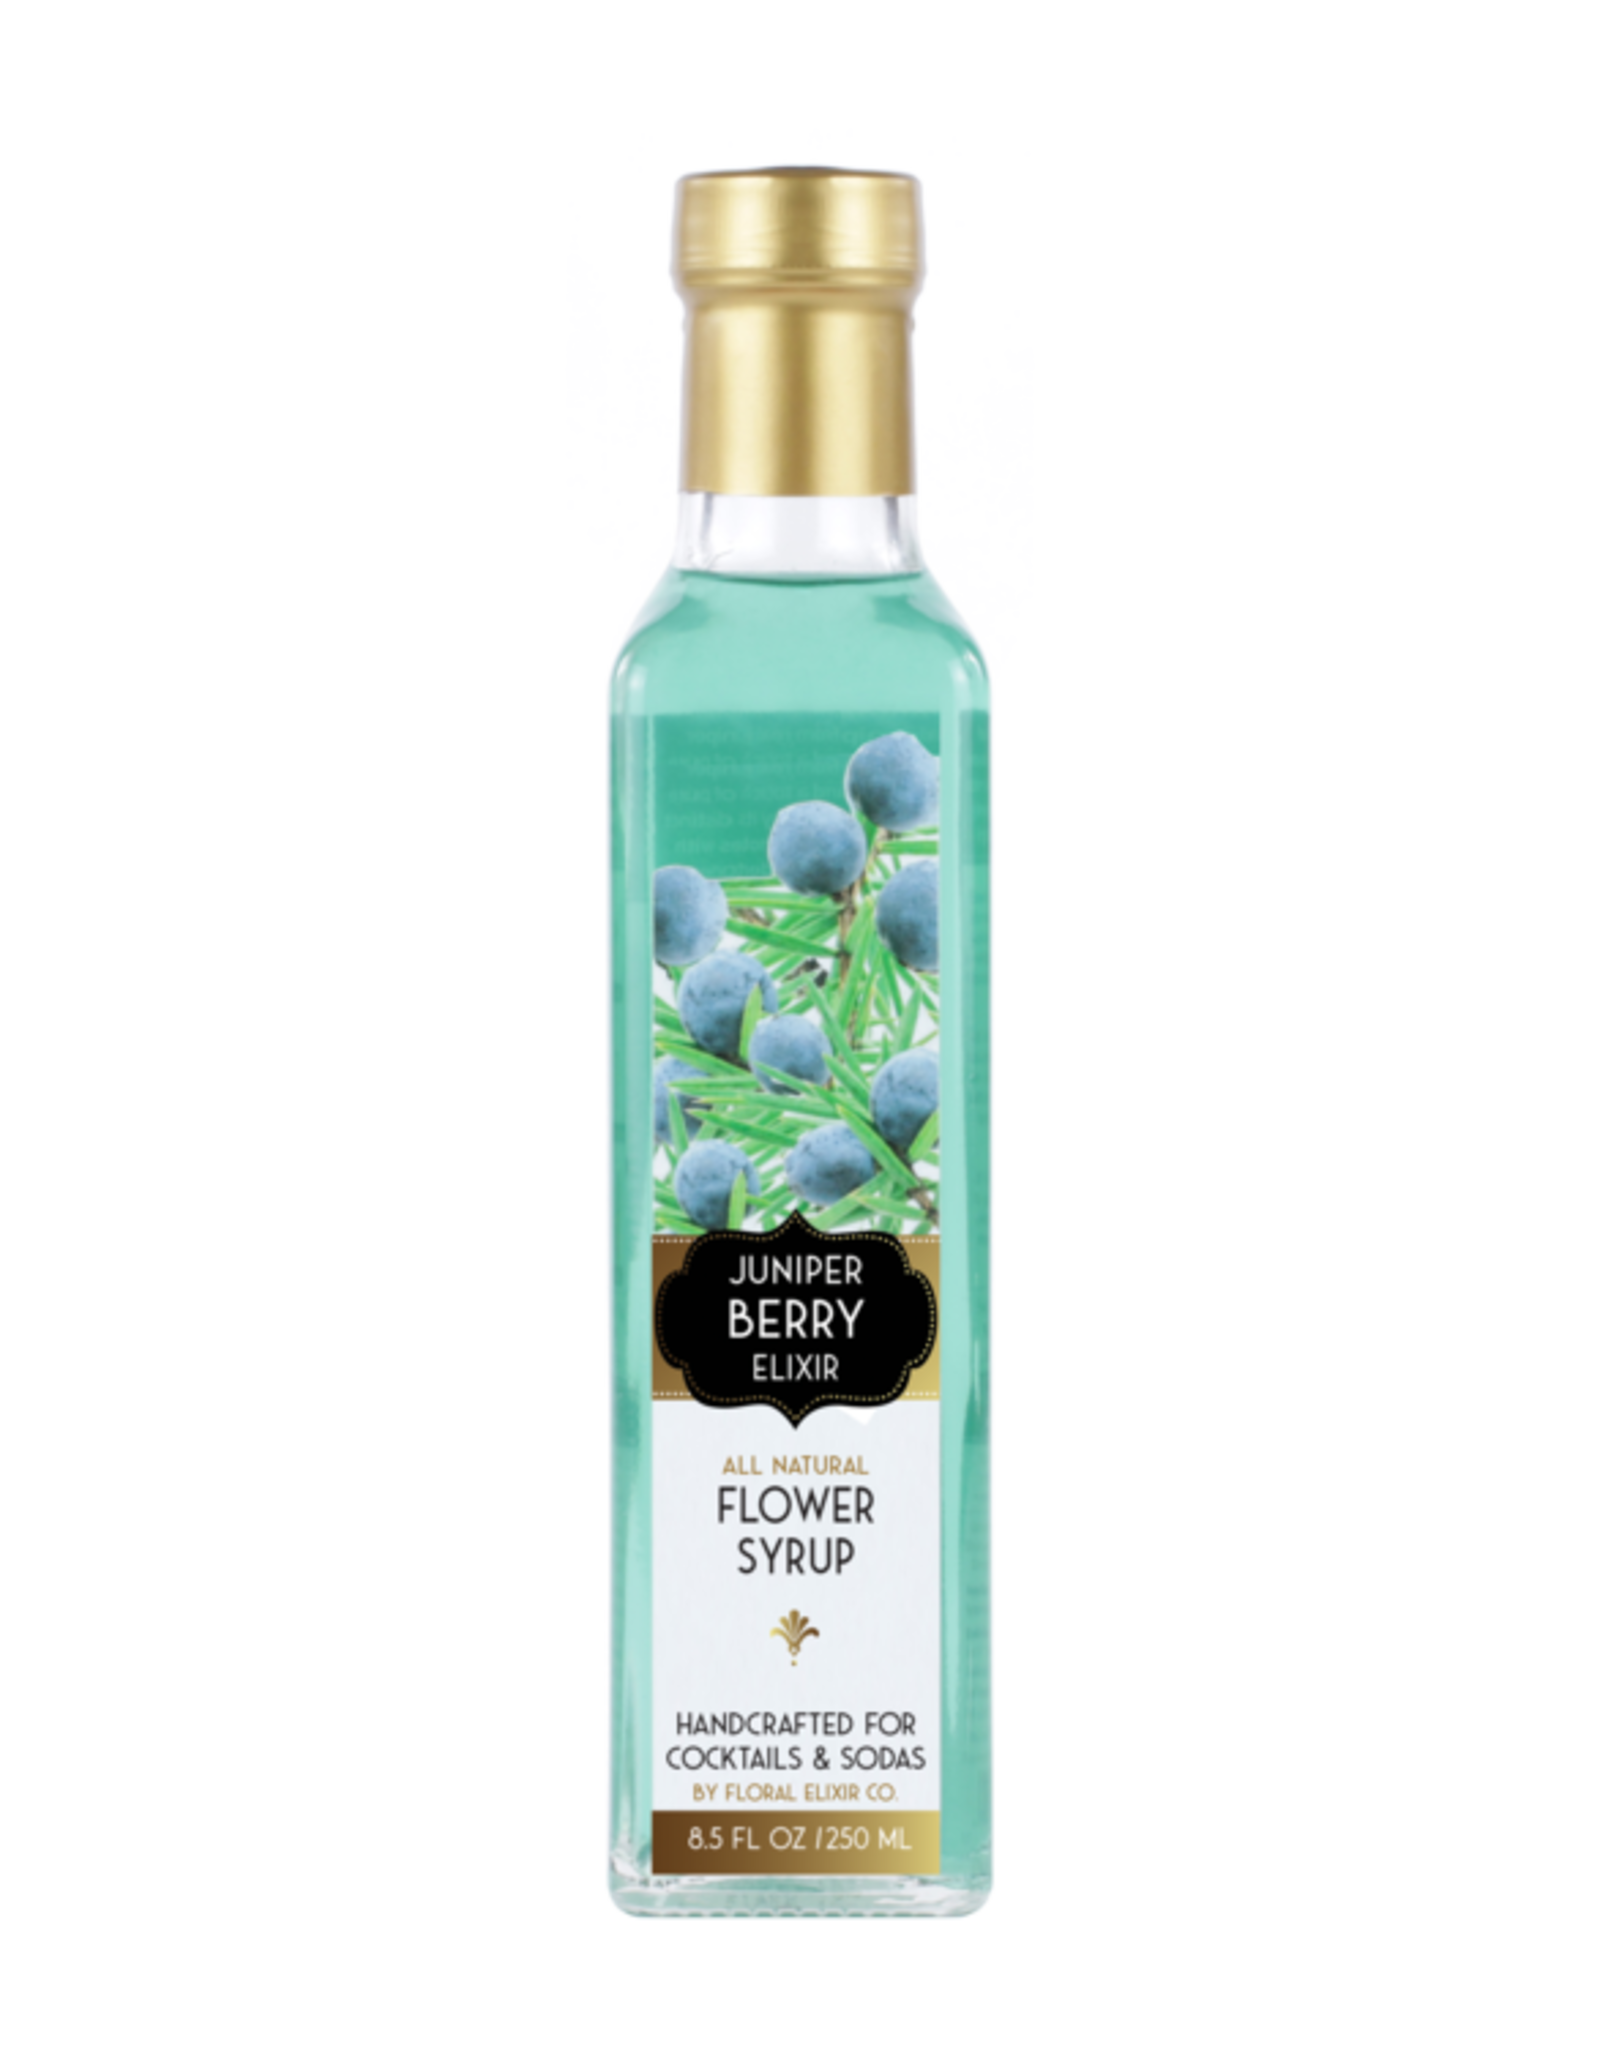 Floral Elixir Company Juniper Berry Elixir